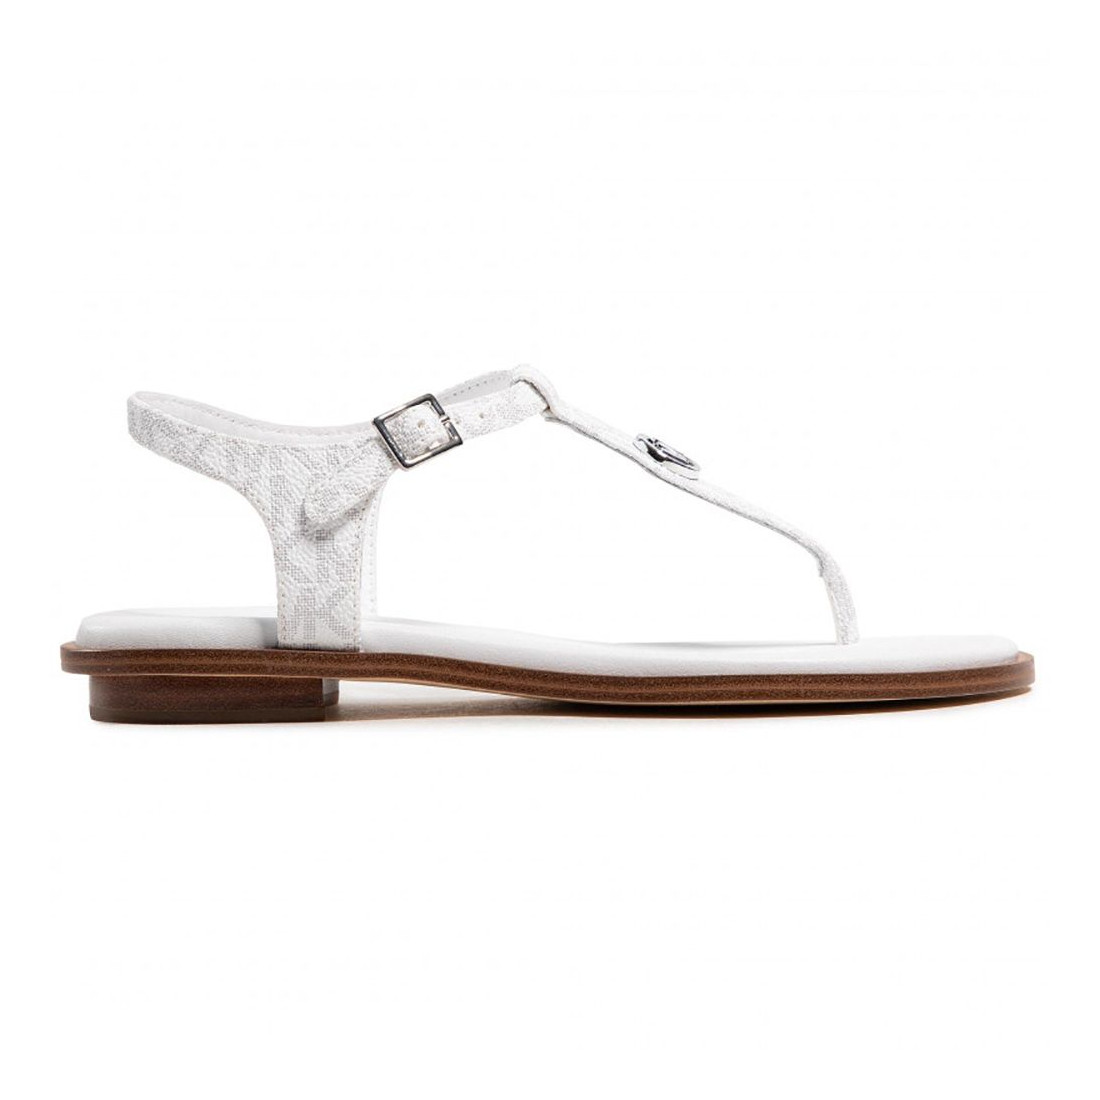 sandalen damen michael kors 40s1mafa1b119 8600